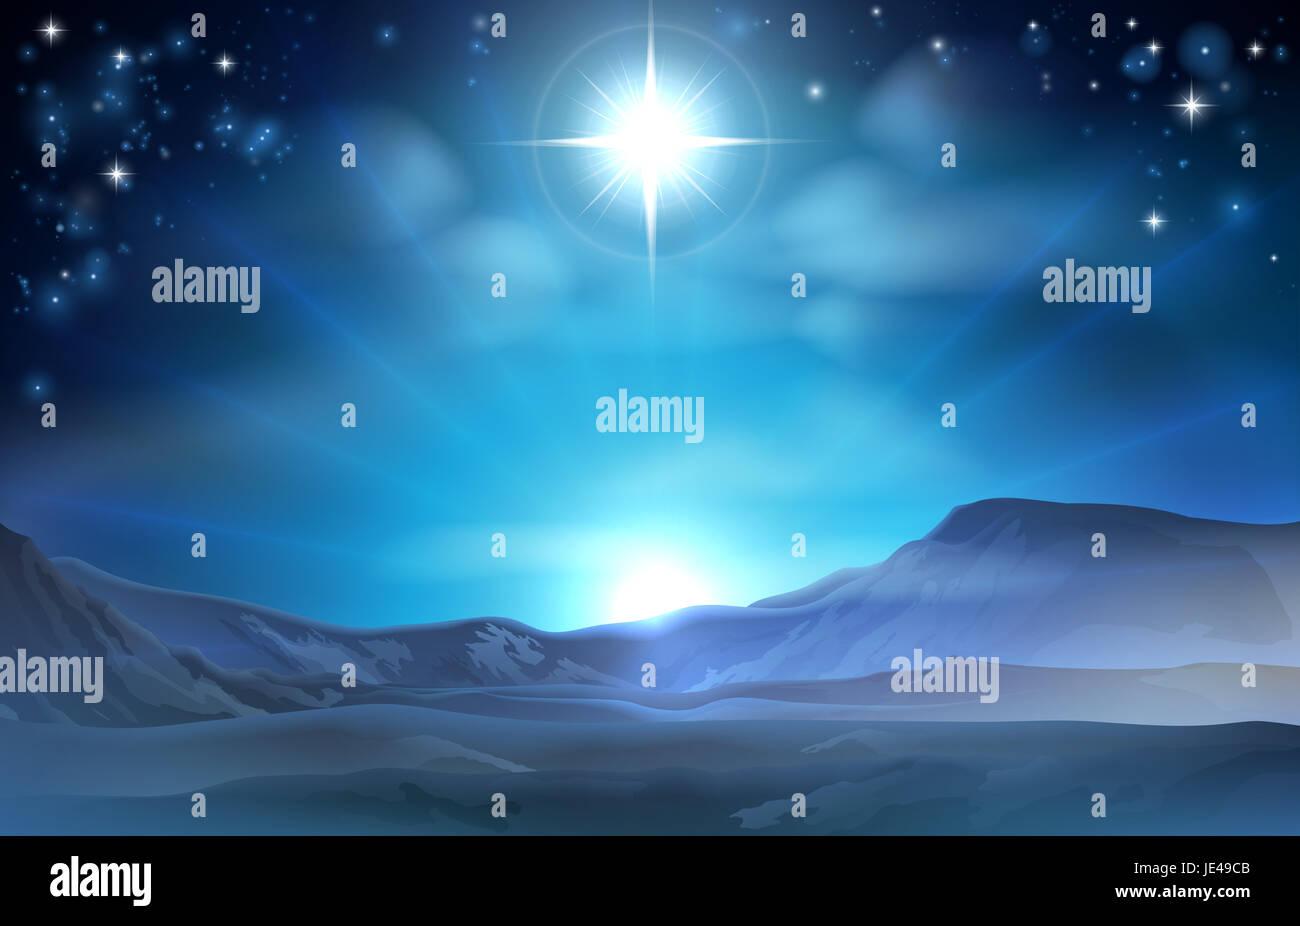 Christmas Nativity Star of Bethlehem illustration of the star over